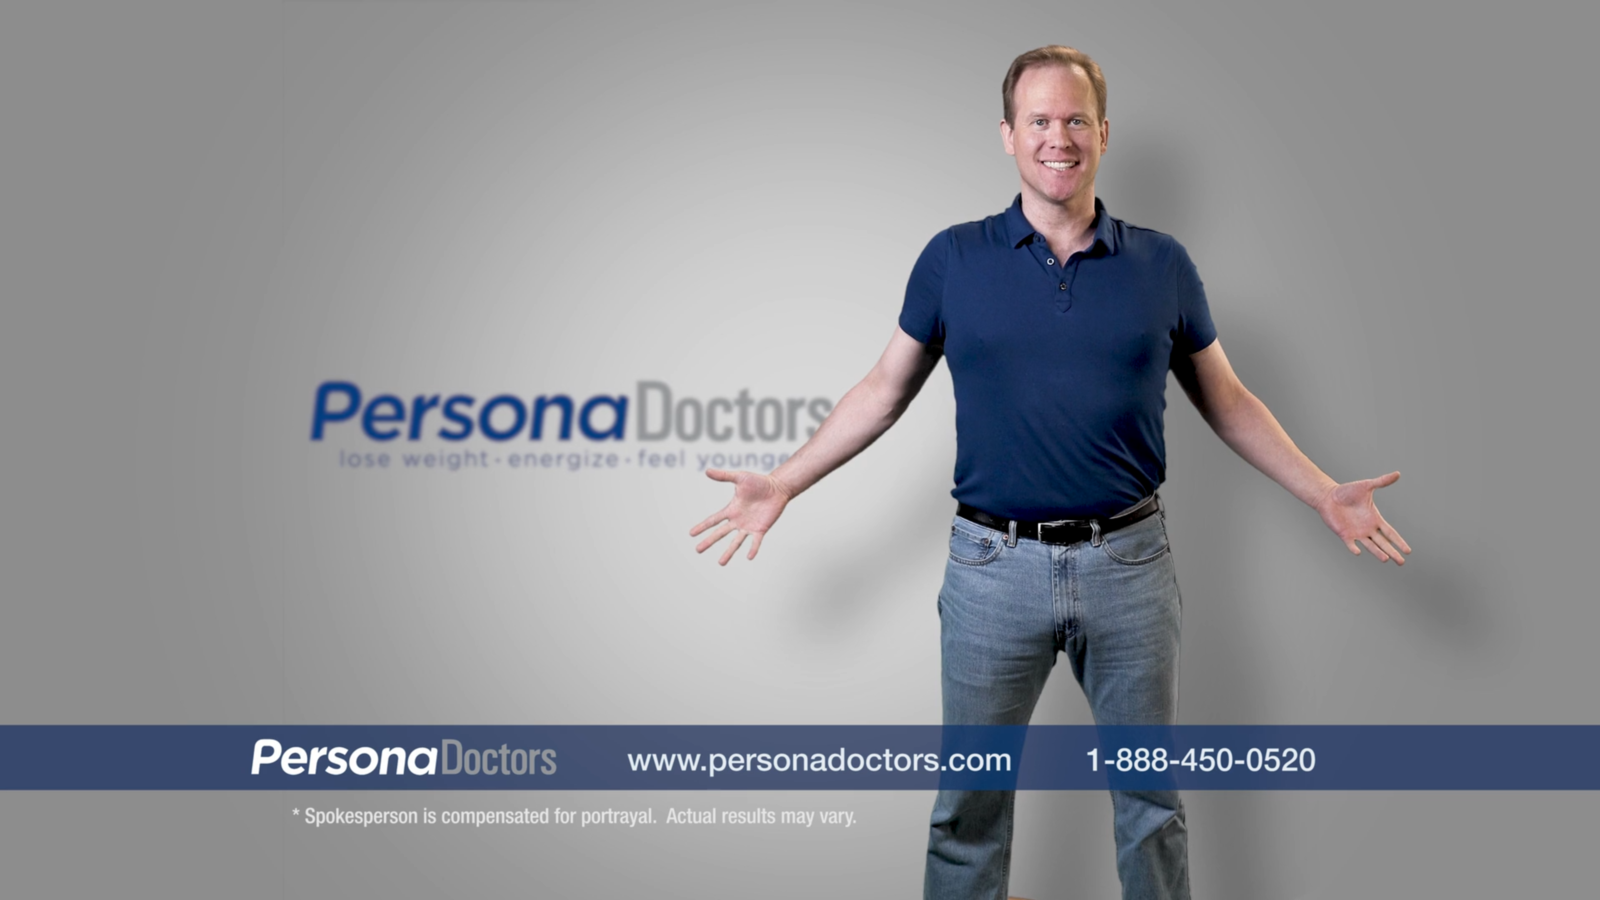 Persona Doctors Client